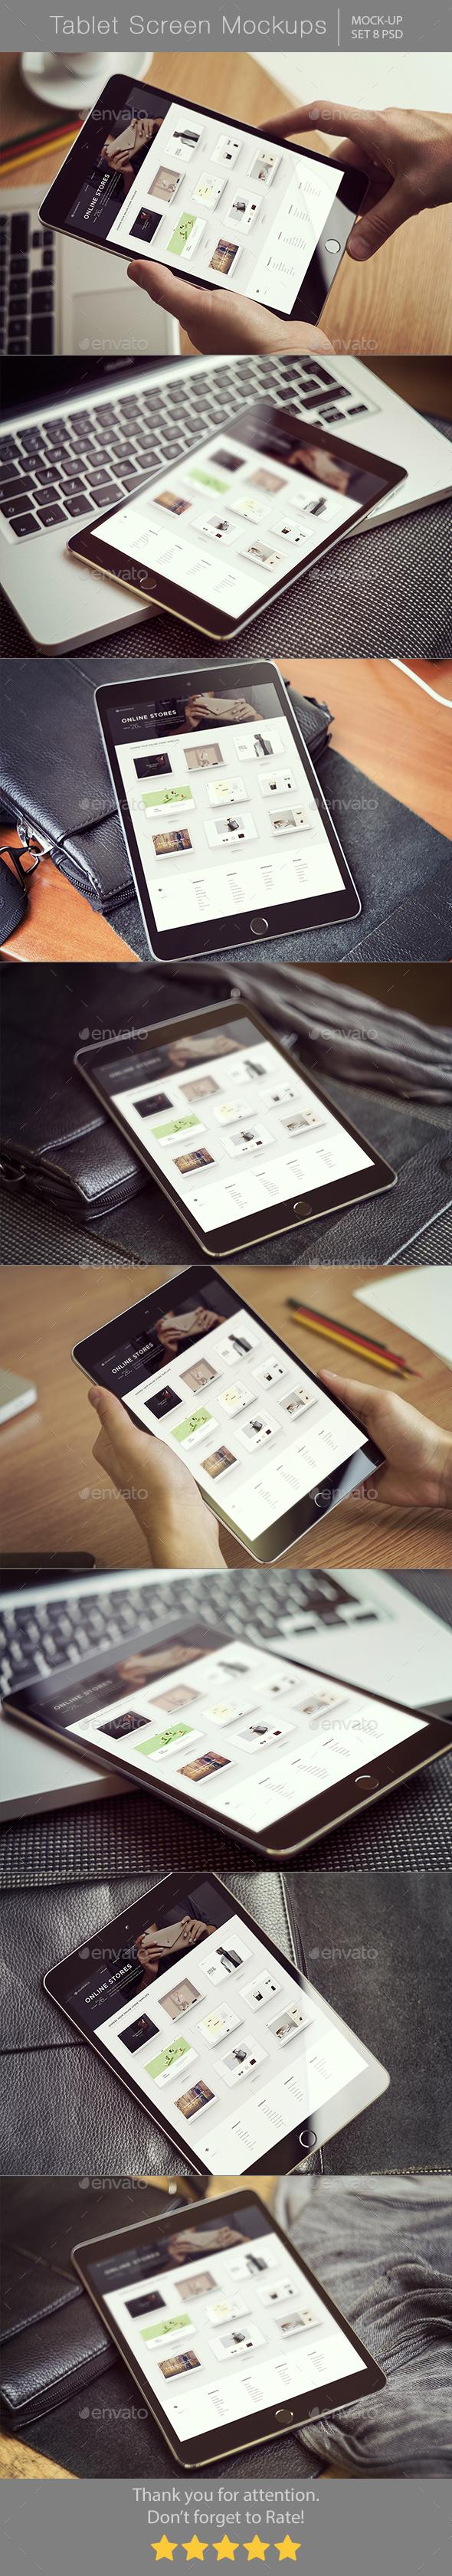 Tablet Screen Mockups - Displays Product Mock-Ups